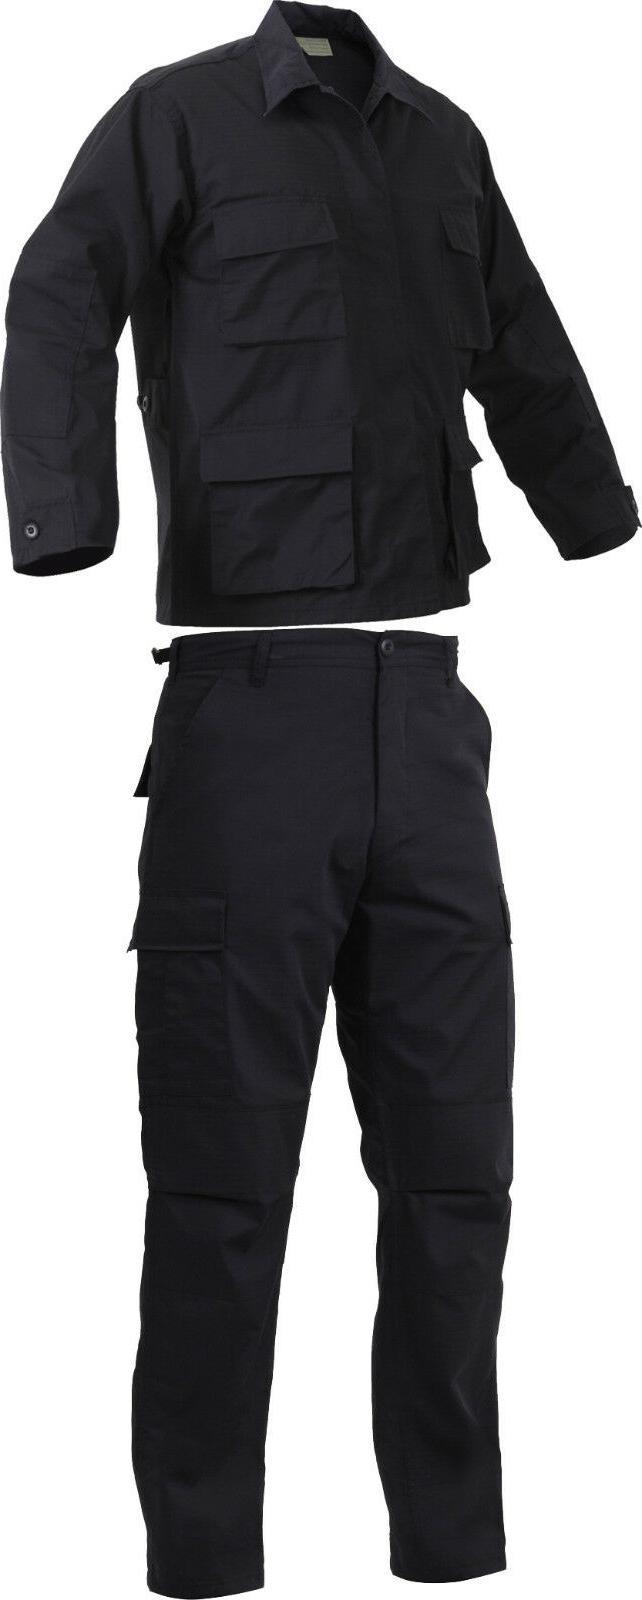 Black Rip-Stop SWAT Cloth Poly-Cotton Cargo BDU Law Enforcem